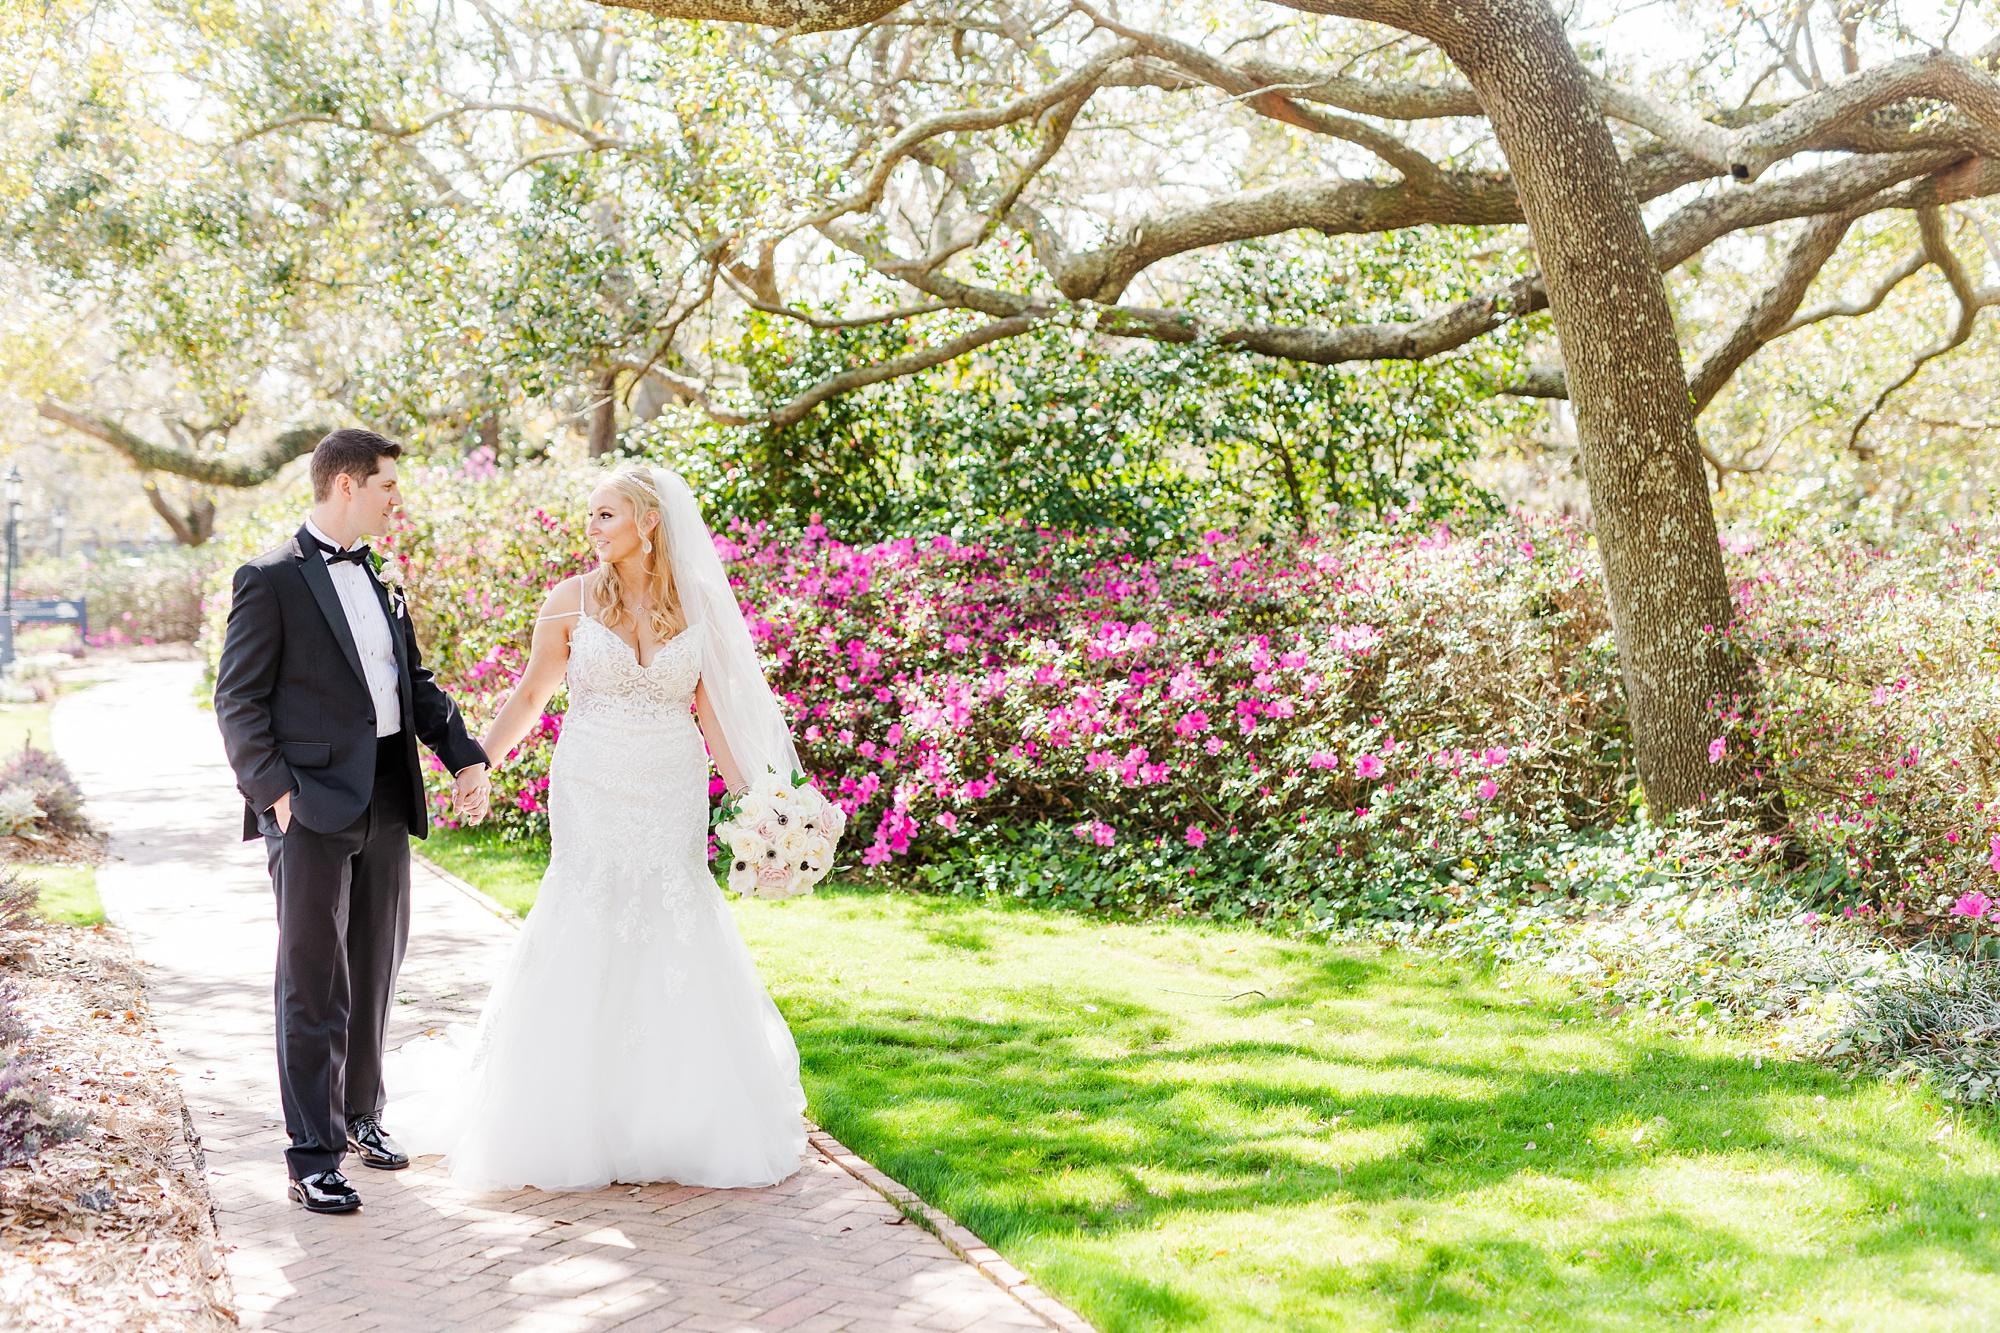 bride and groom walk through gardens in Alabama